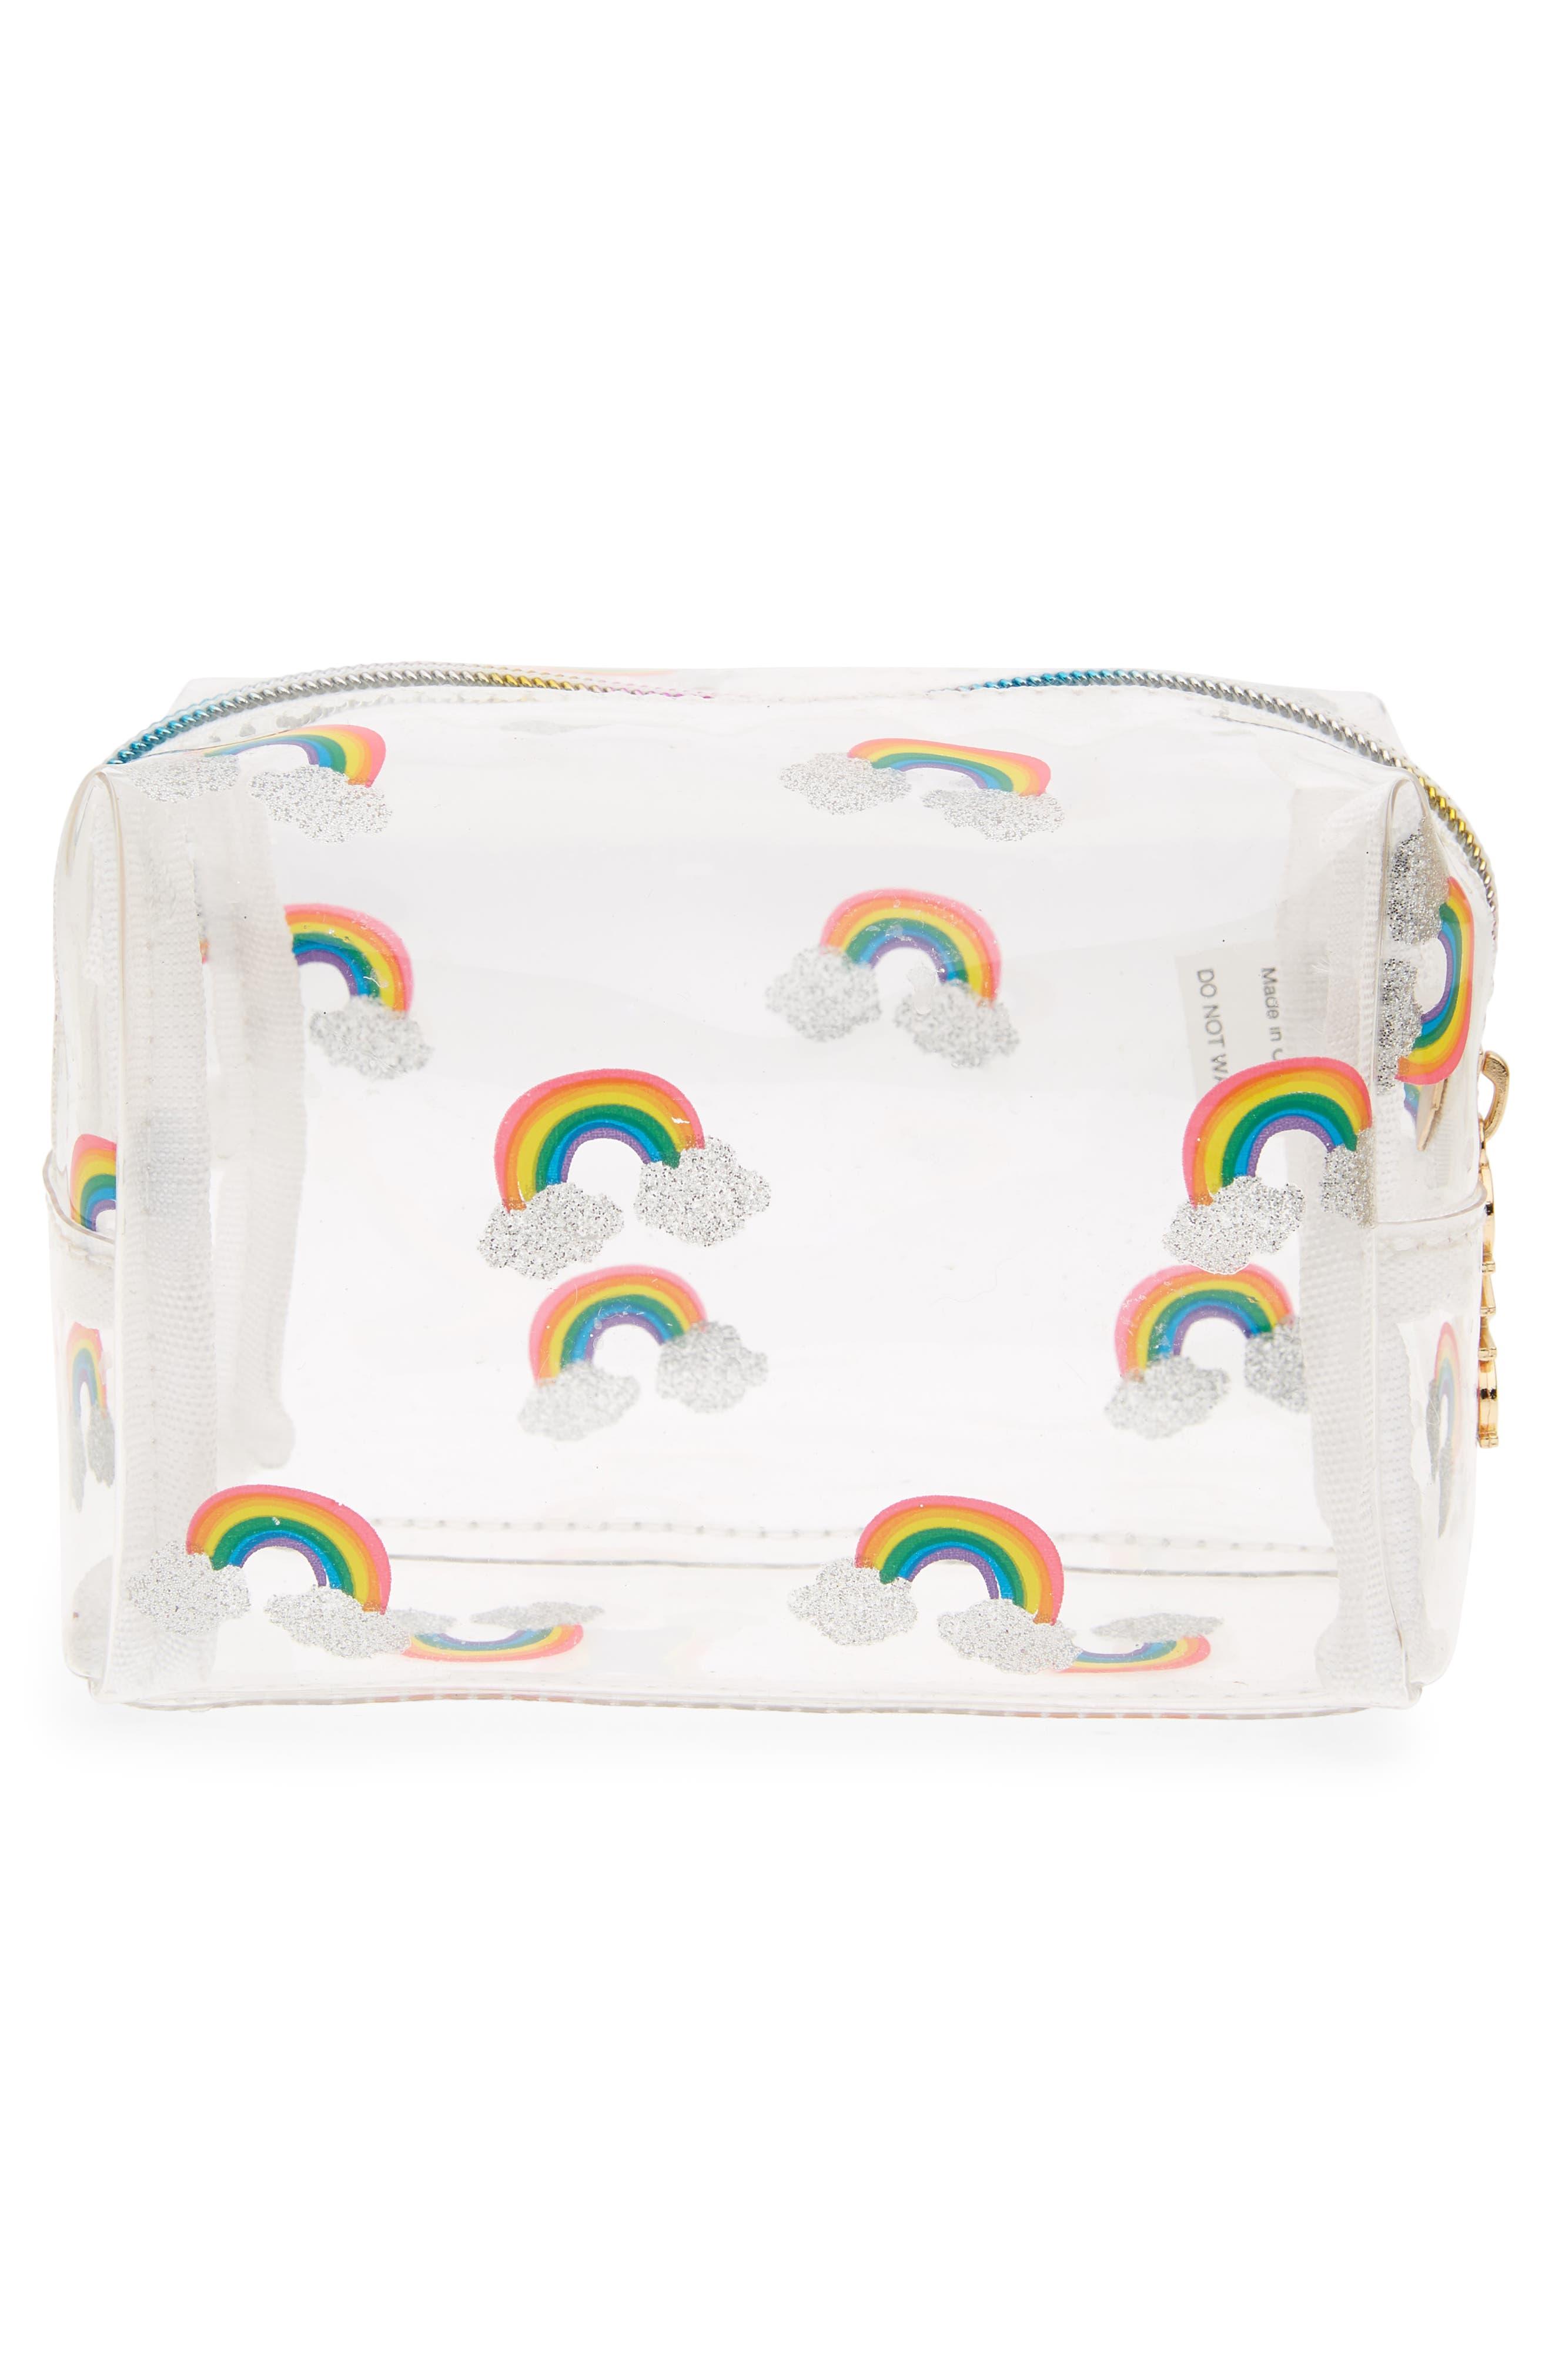 Rainbow Cosmetics Bag,                             Alternate thumbnail 2, color,                             100